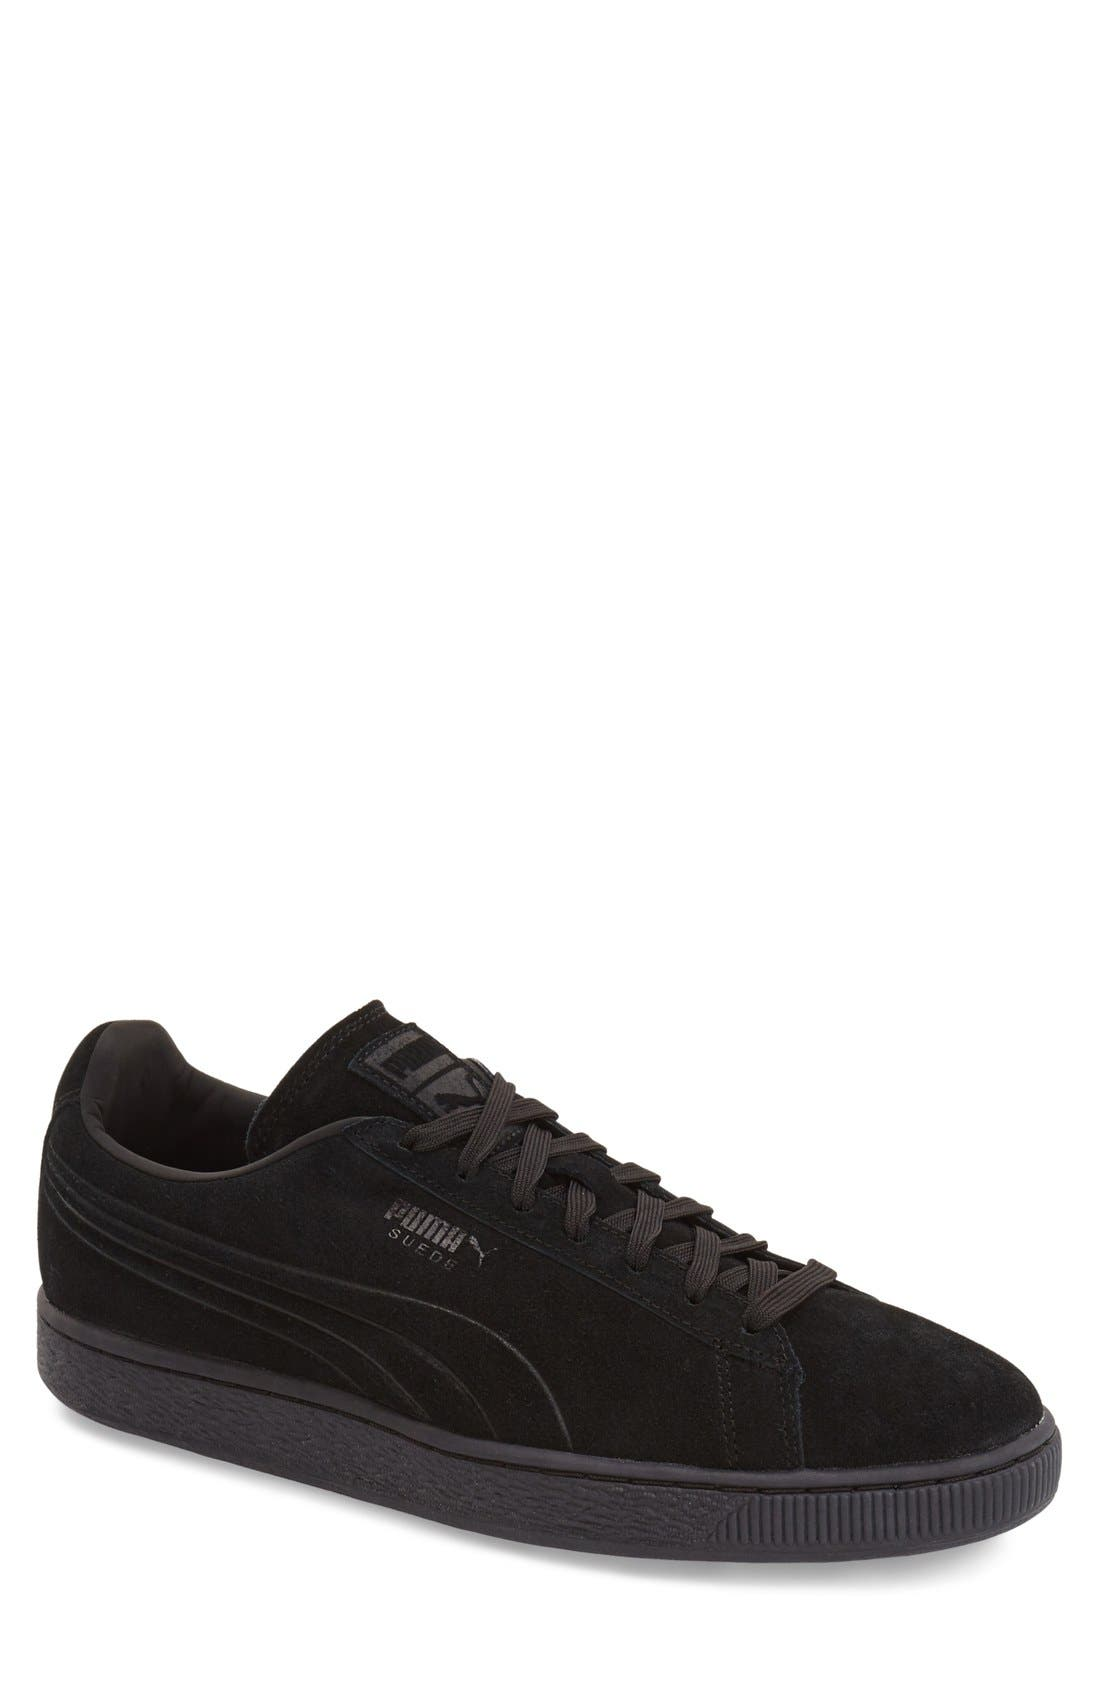 Alternate Image 1 Selected - PUMA 'Suede Iced' Sneaker (Men)